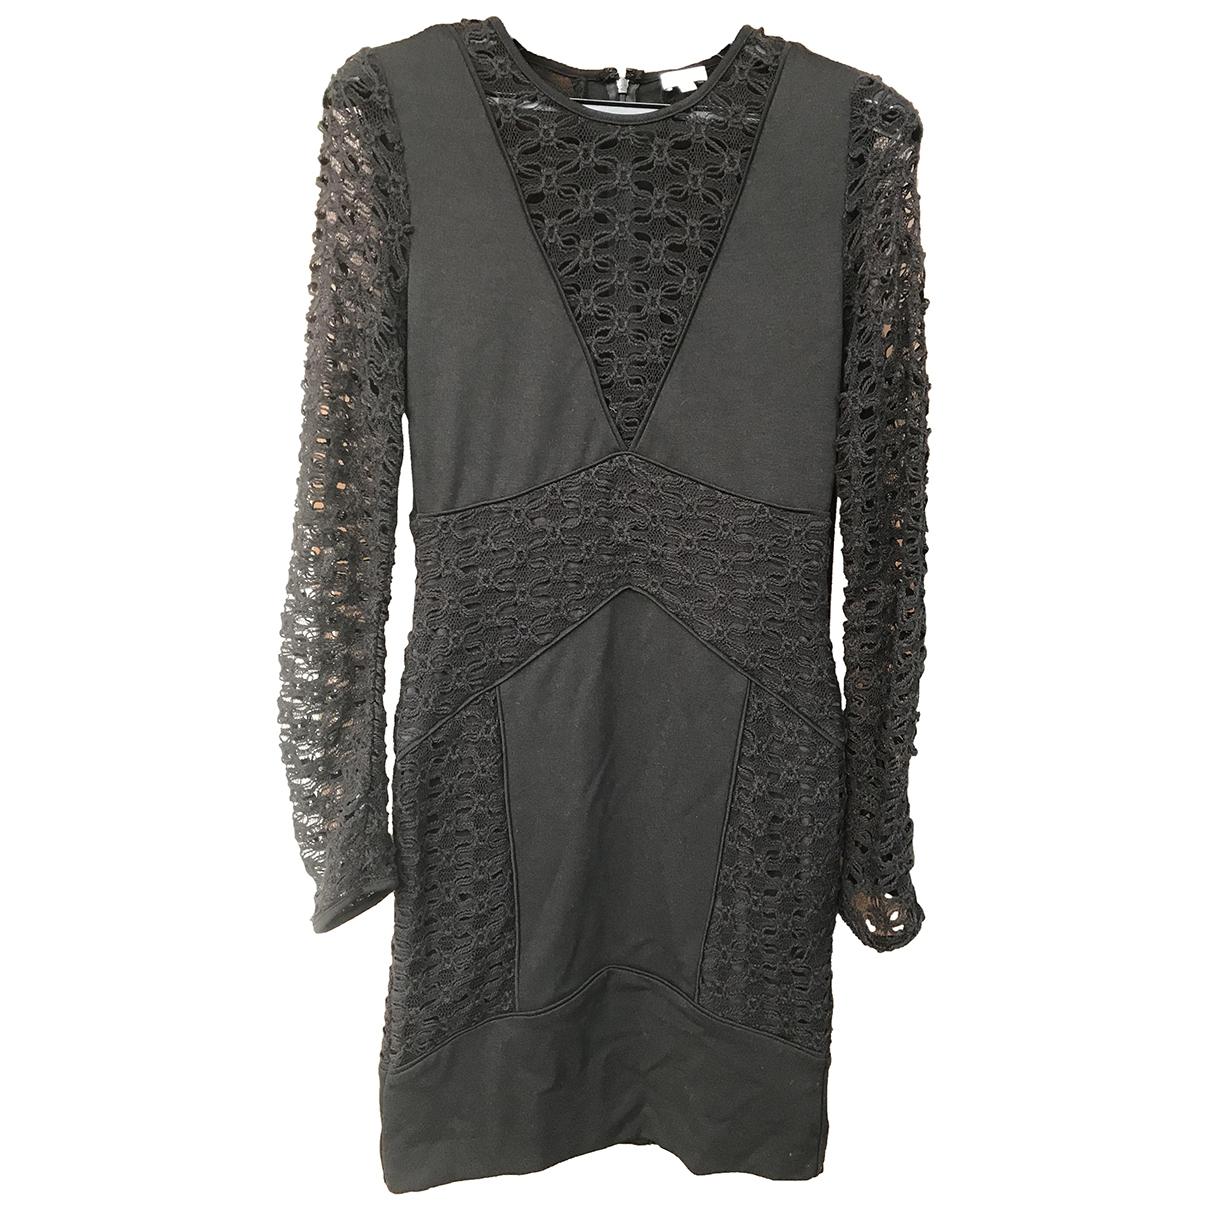 Hoss Intropia \N Black Cotton dress for Women XS International